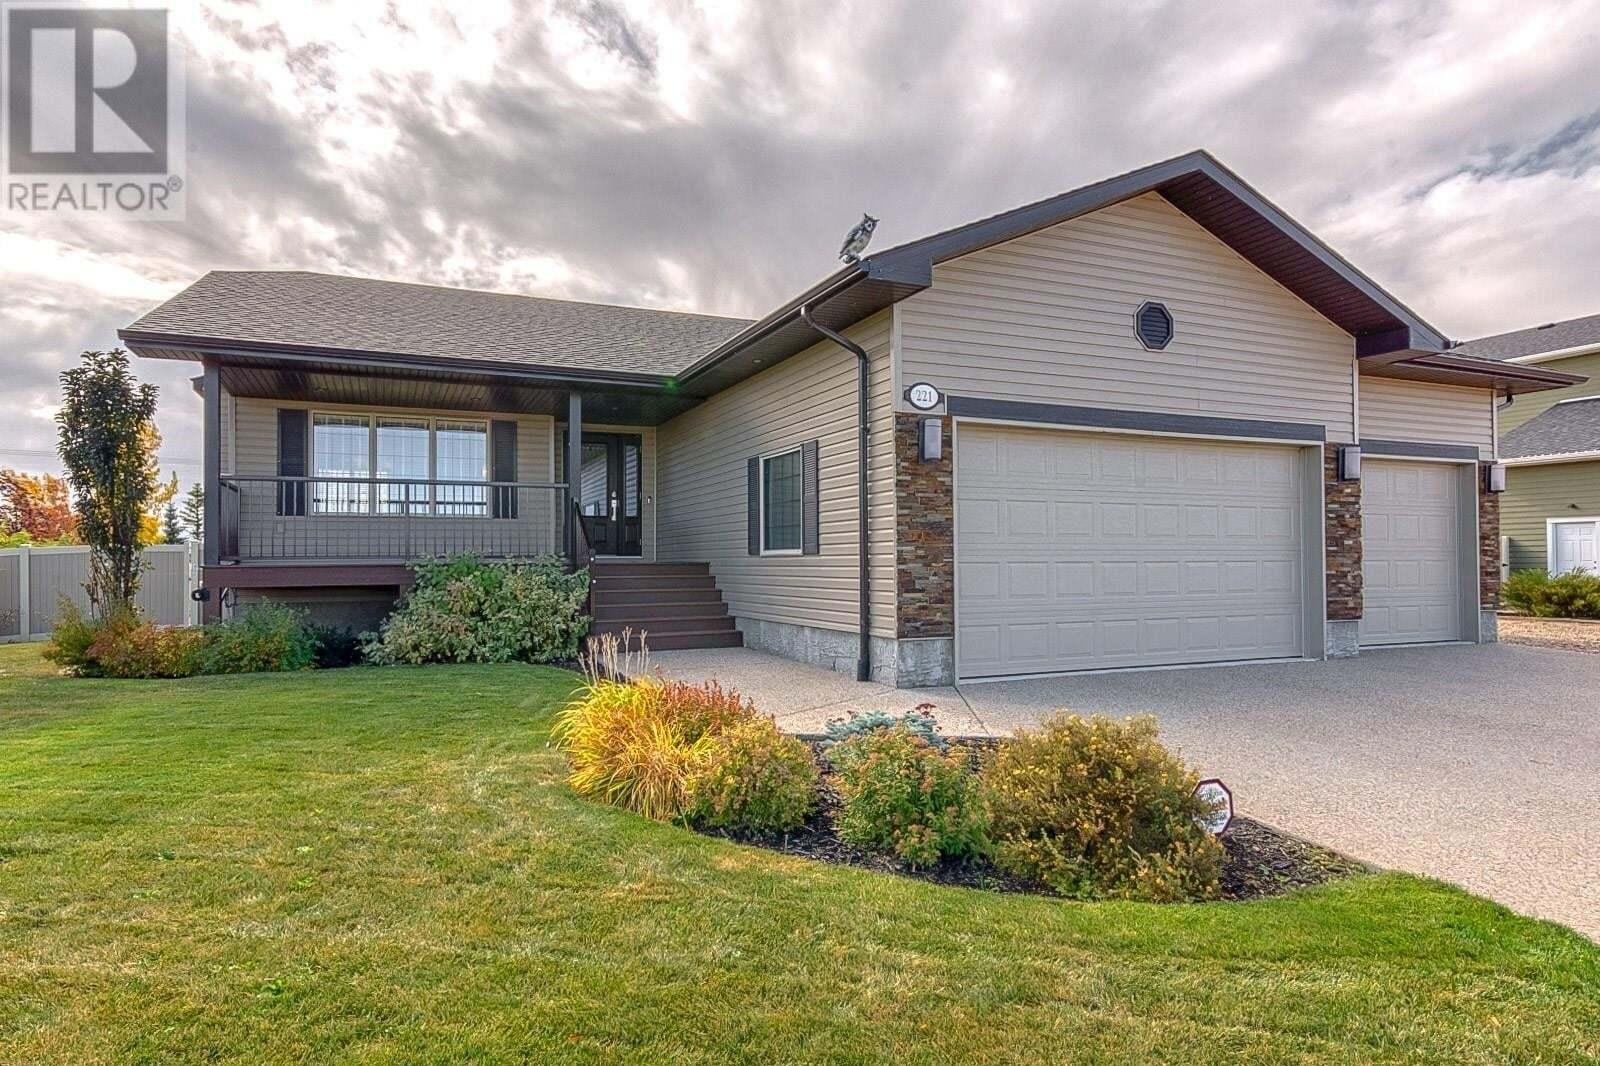 House for sale at 221 Edgewood Dr Buena Vista Saskatchewan - MLS: SK828490